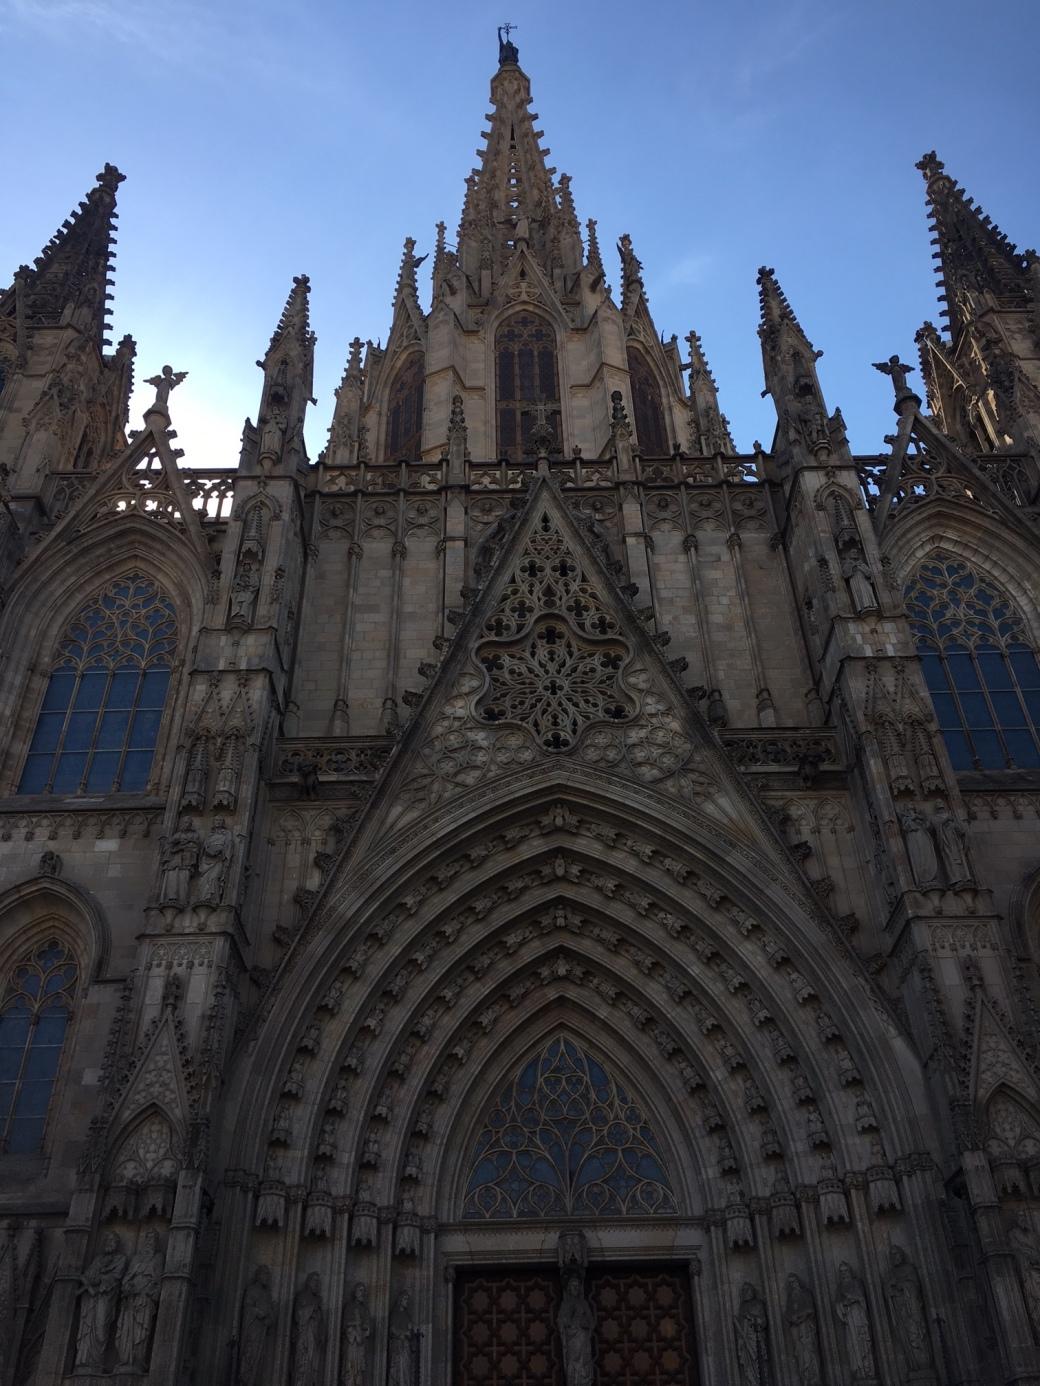 Barca_BarcelonaCathedral.jpg